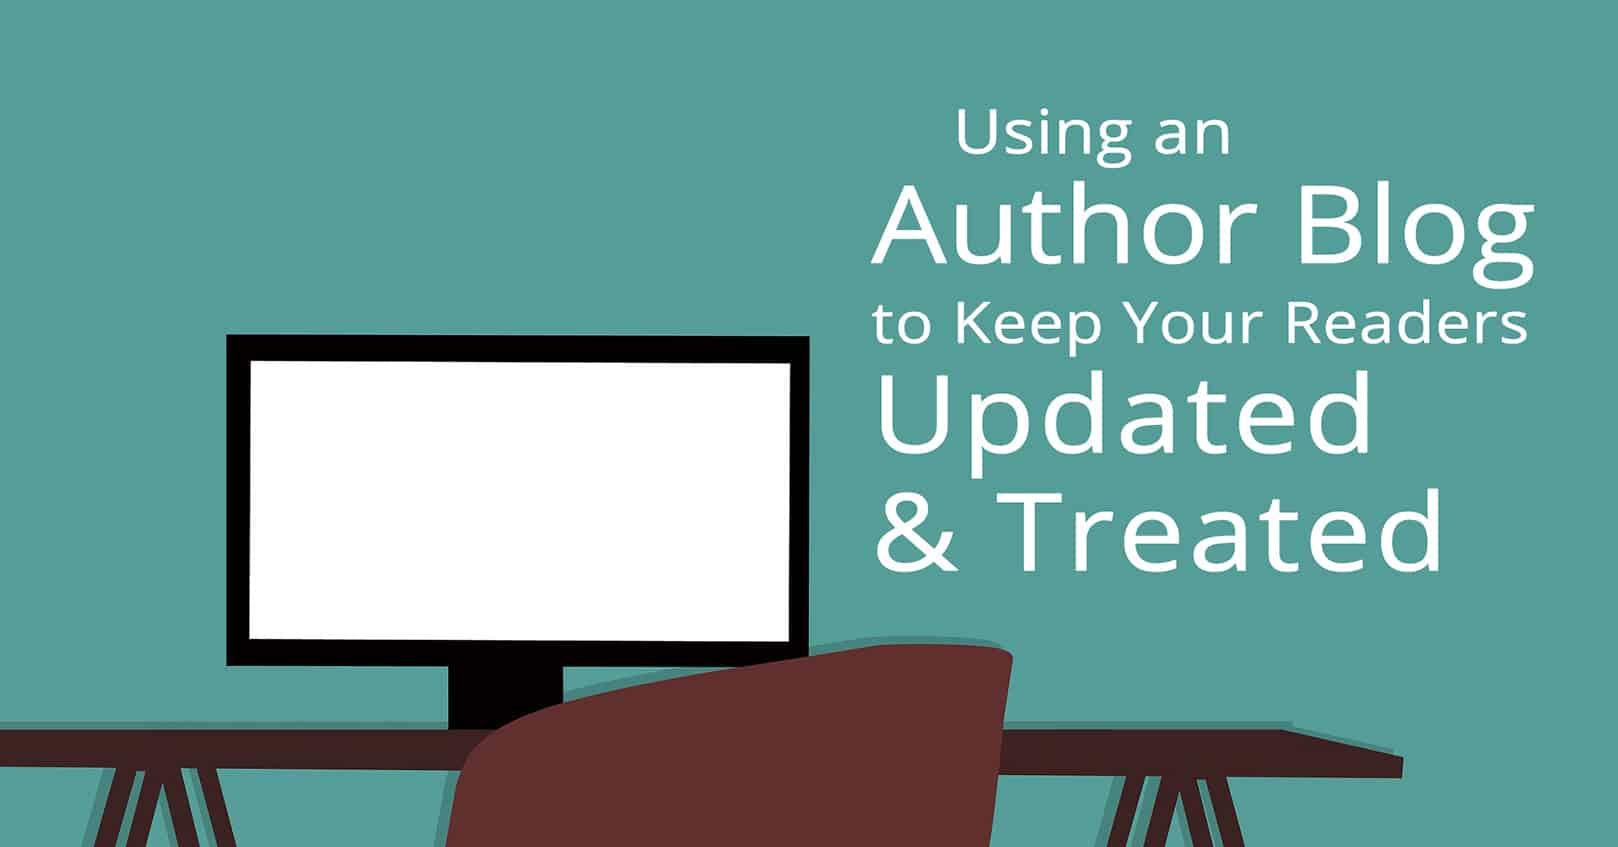 Using an Author Blog